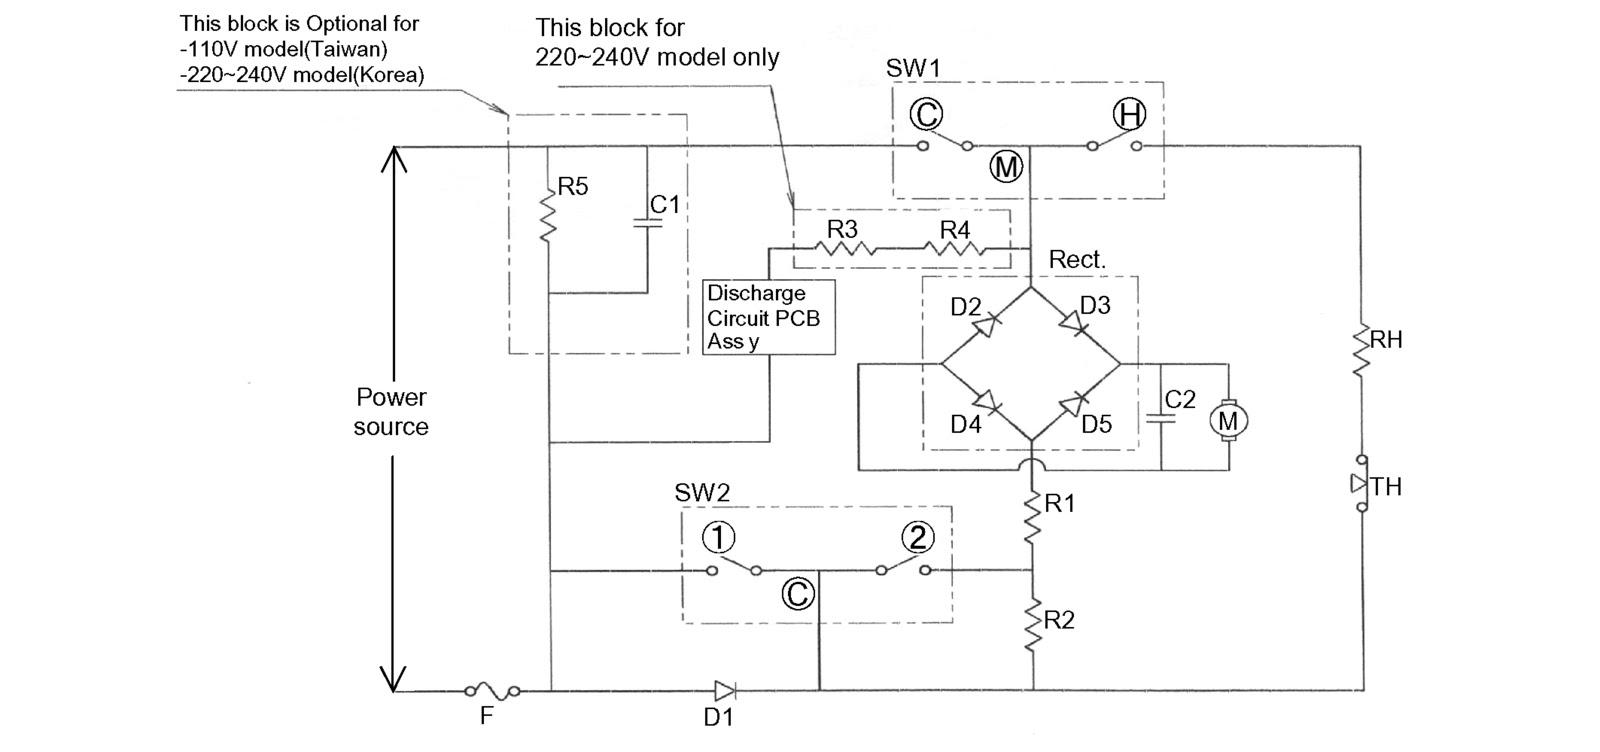 hair dryer circuit diagram wiring diagram pass hair dryer circuit diagram pdf hair dryer wiring diagram [ 1600 x 752 Pixel ]